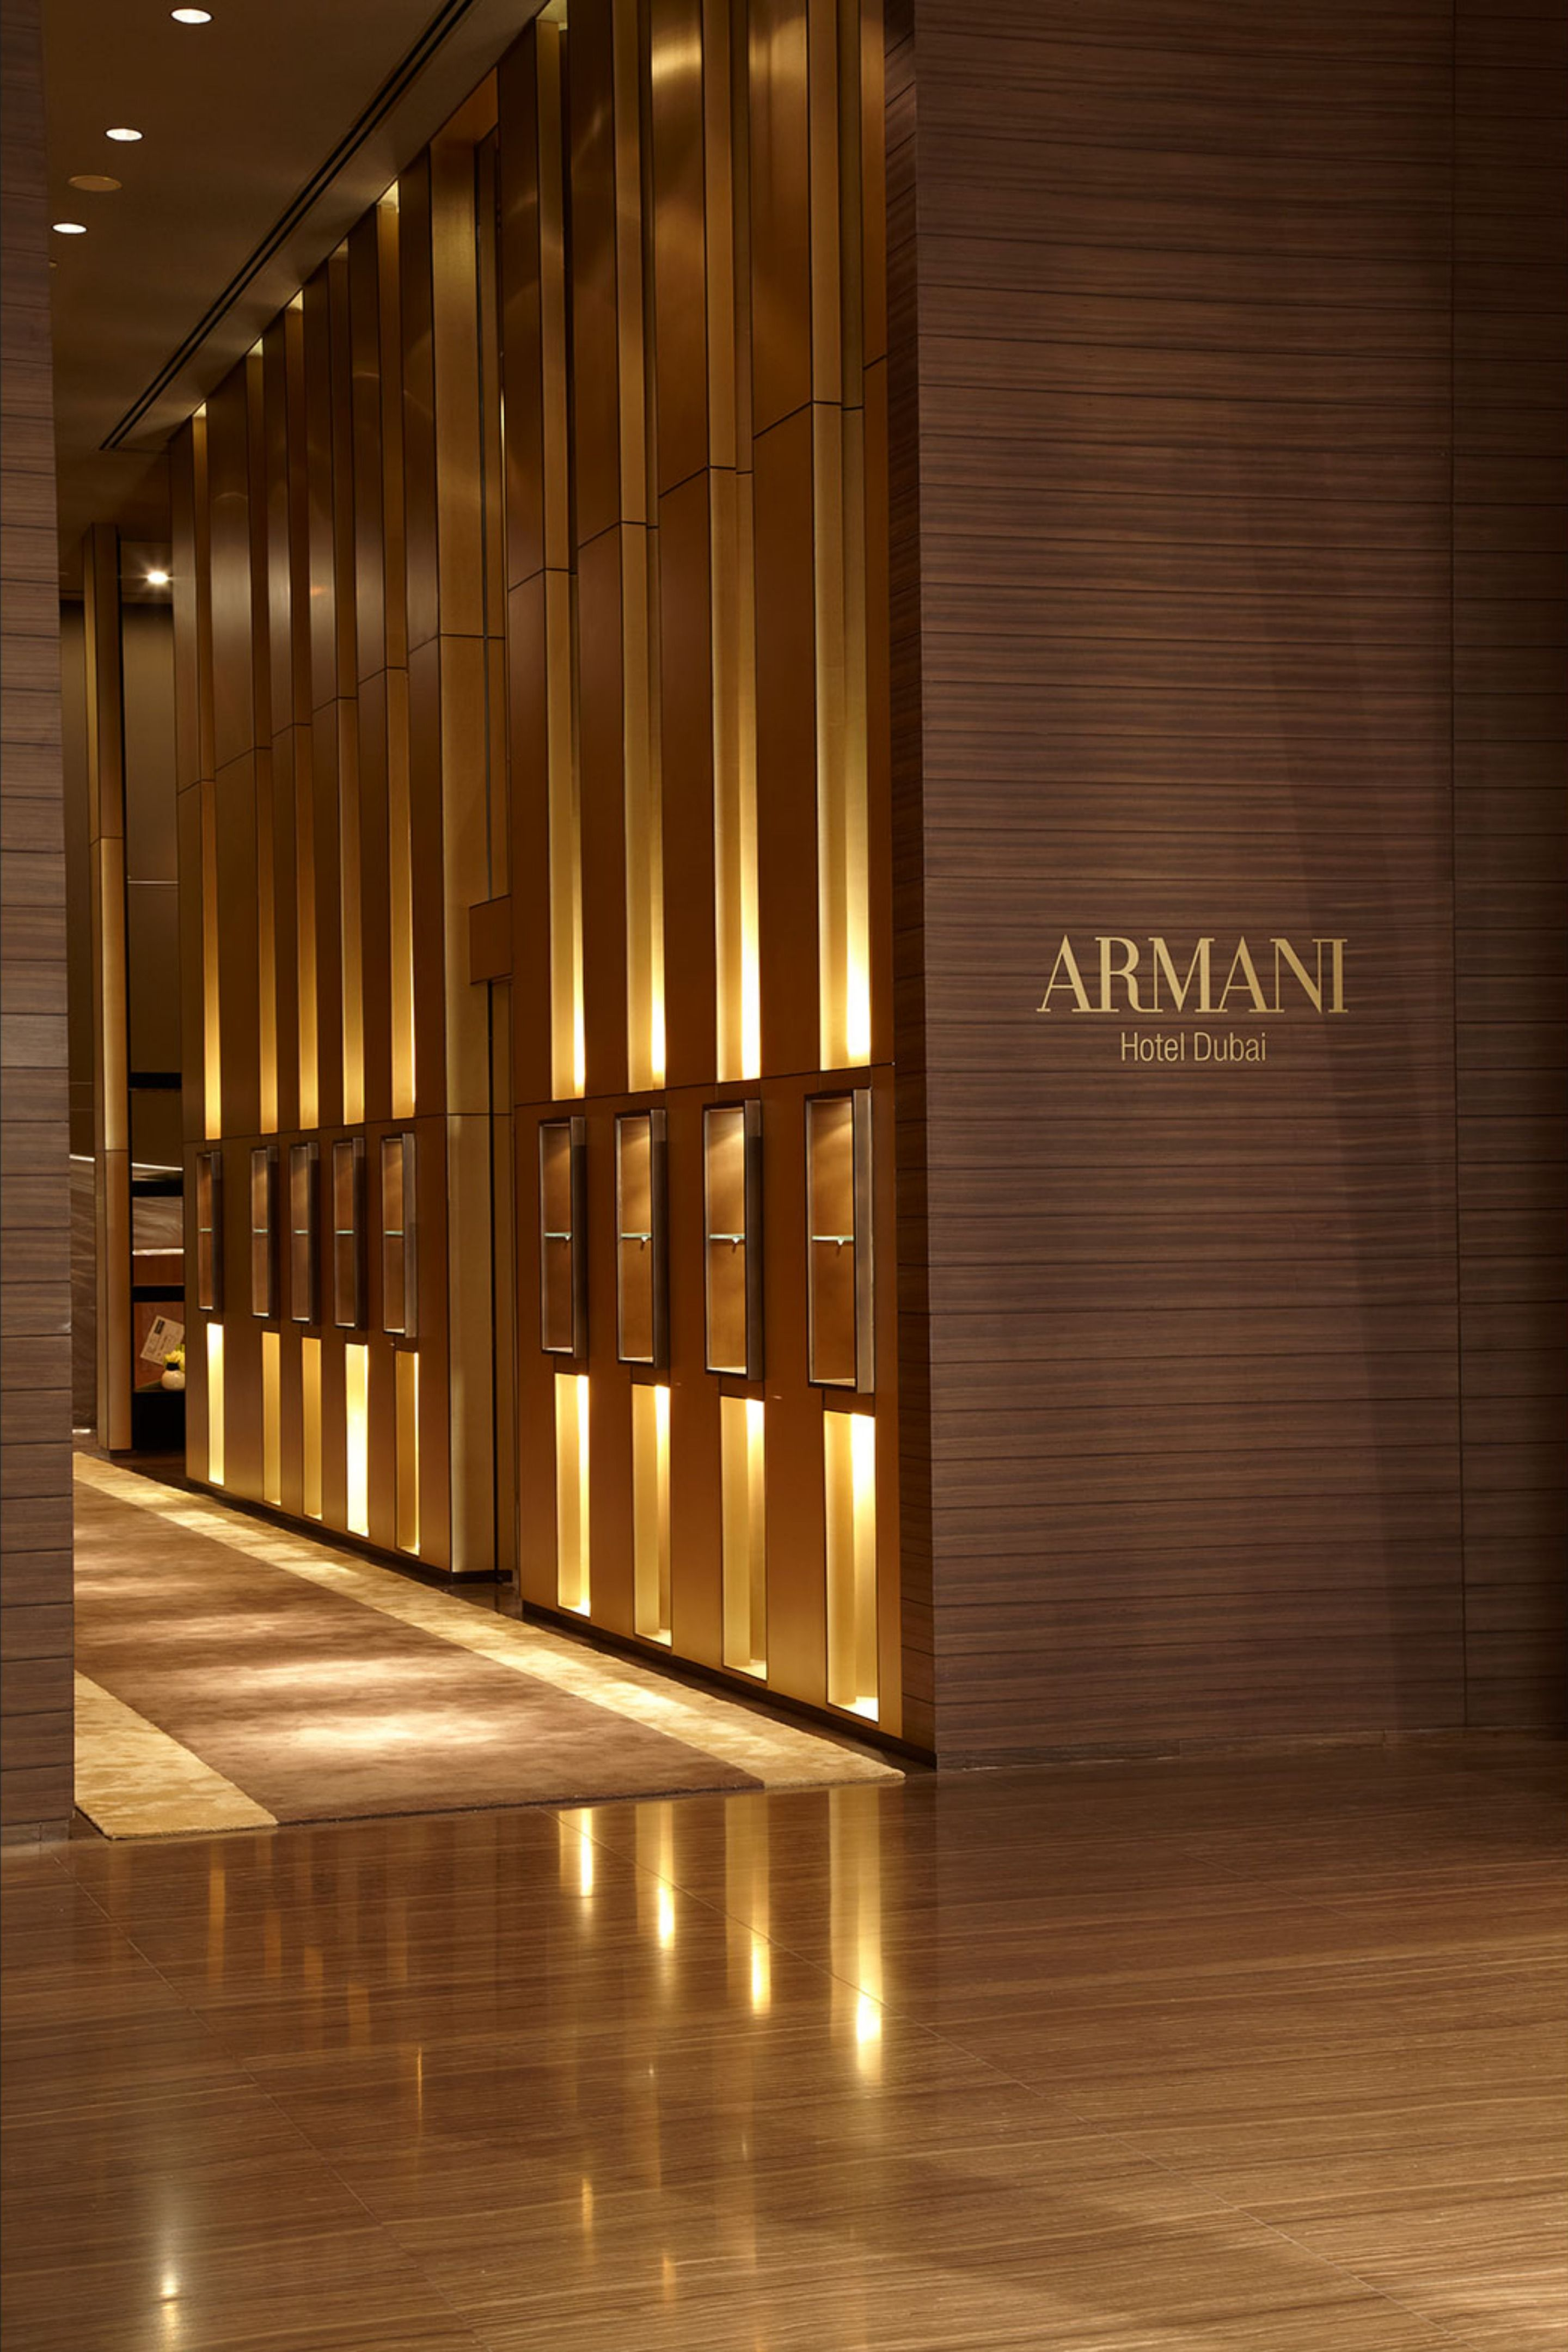 Armani Hotel At The Burj Khalifa With Images Armani Hotel